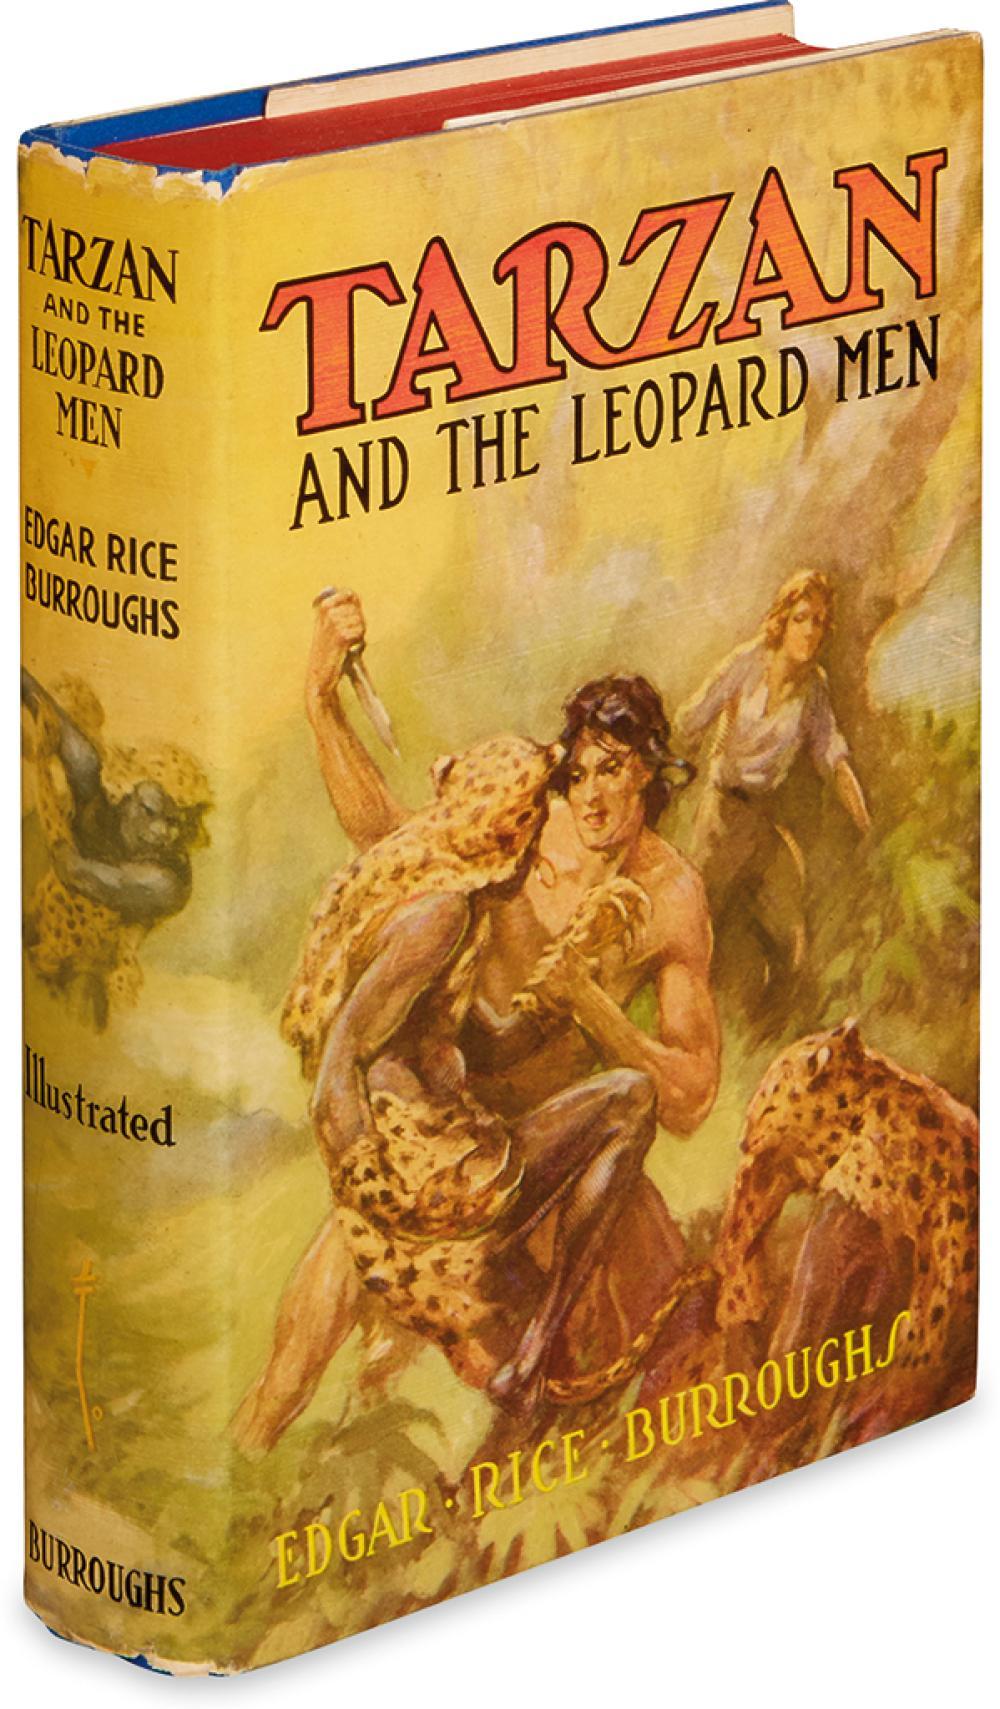 BURROUGHS, EDGAR RICE. Tarzan and the Leopard Men.